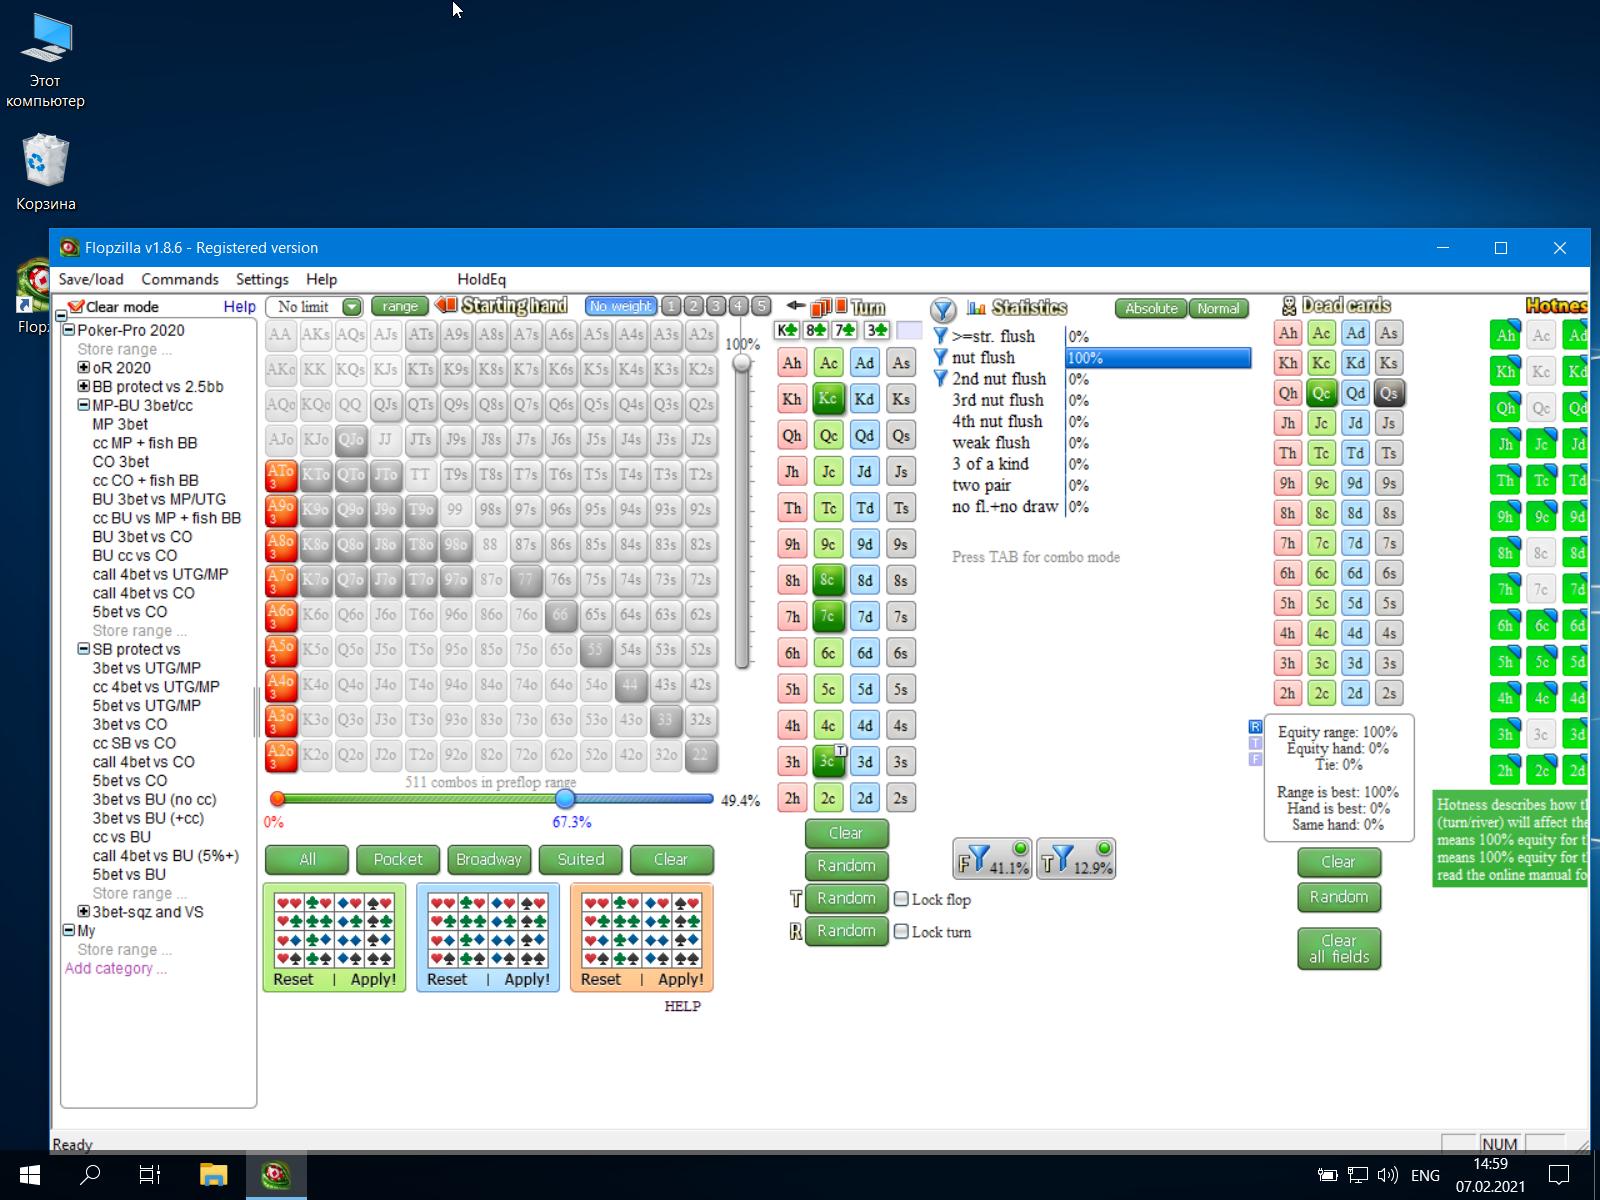 virtualboxwin-10070220211503461612699457.png